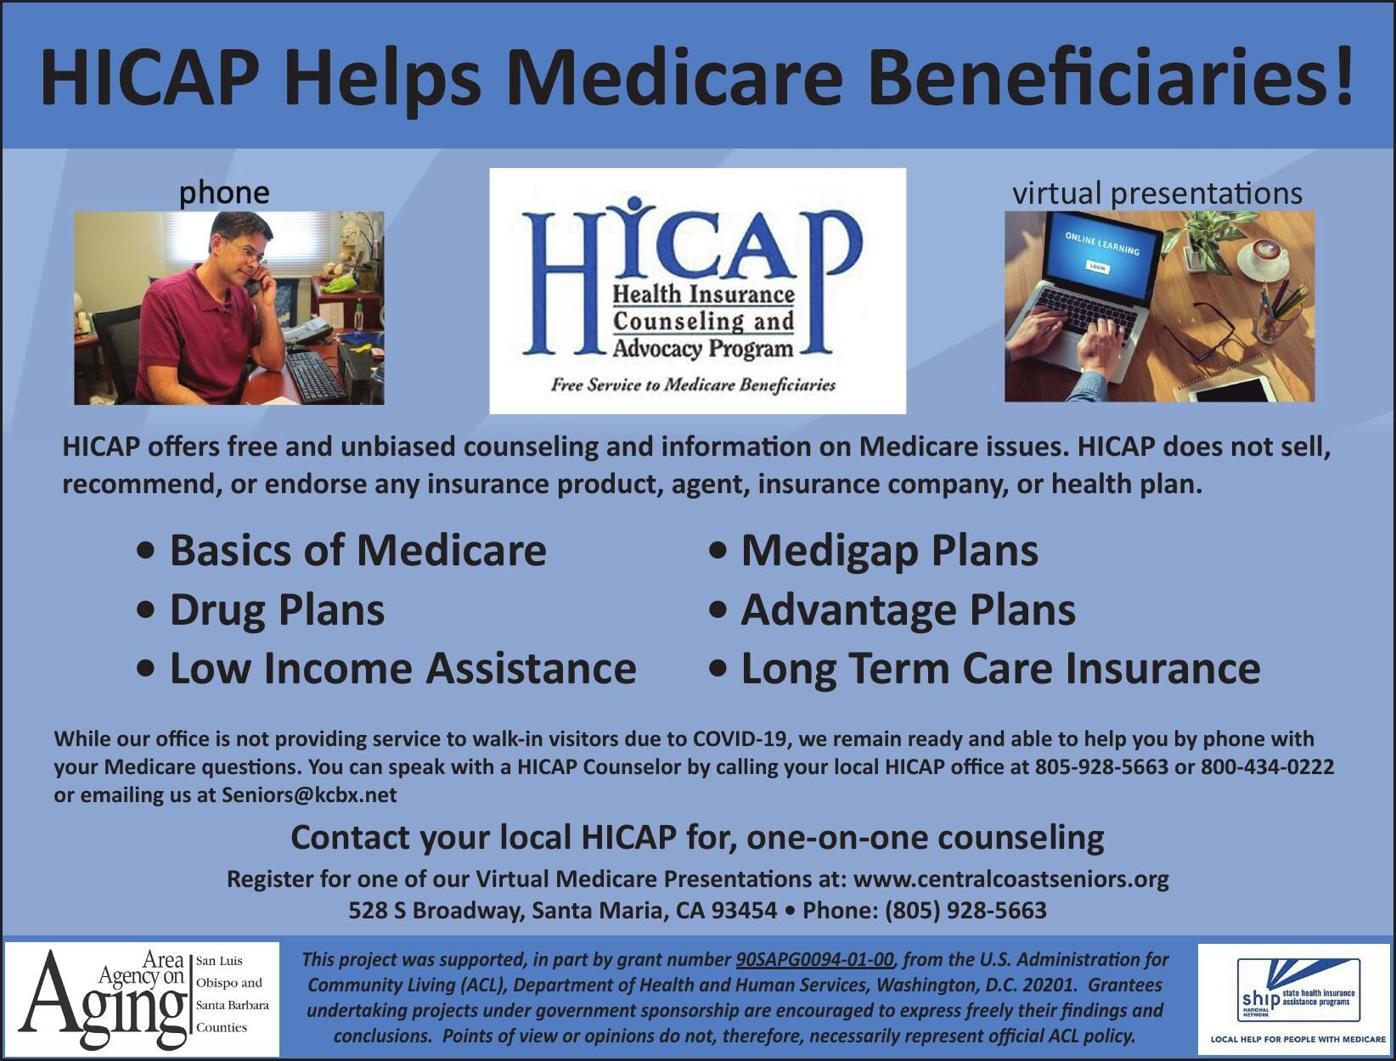 HICAP Helps Medicare Beneficiaries!